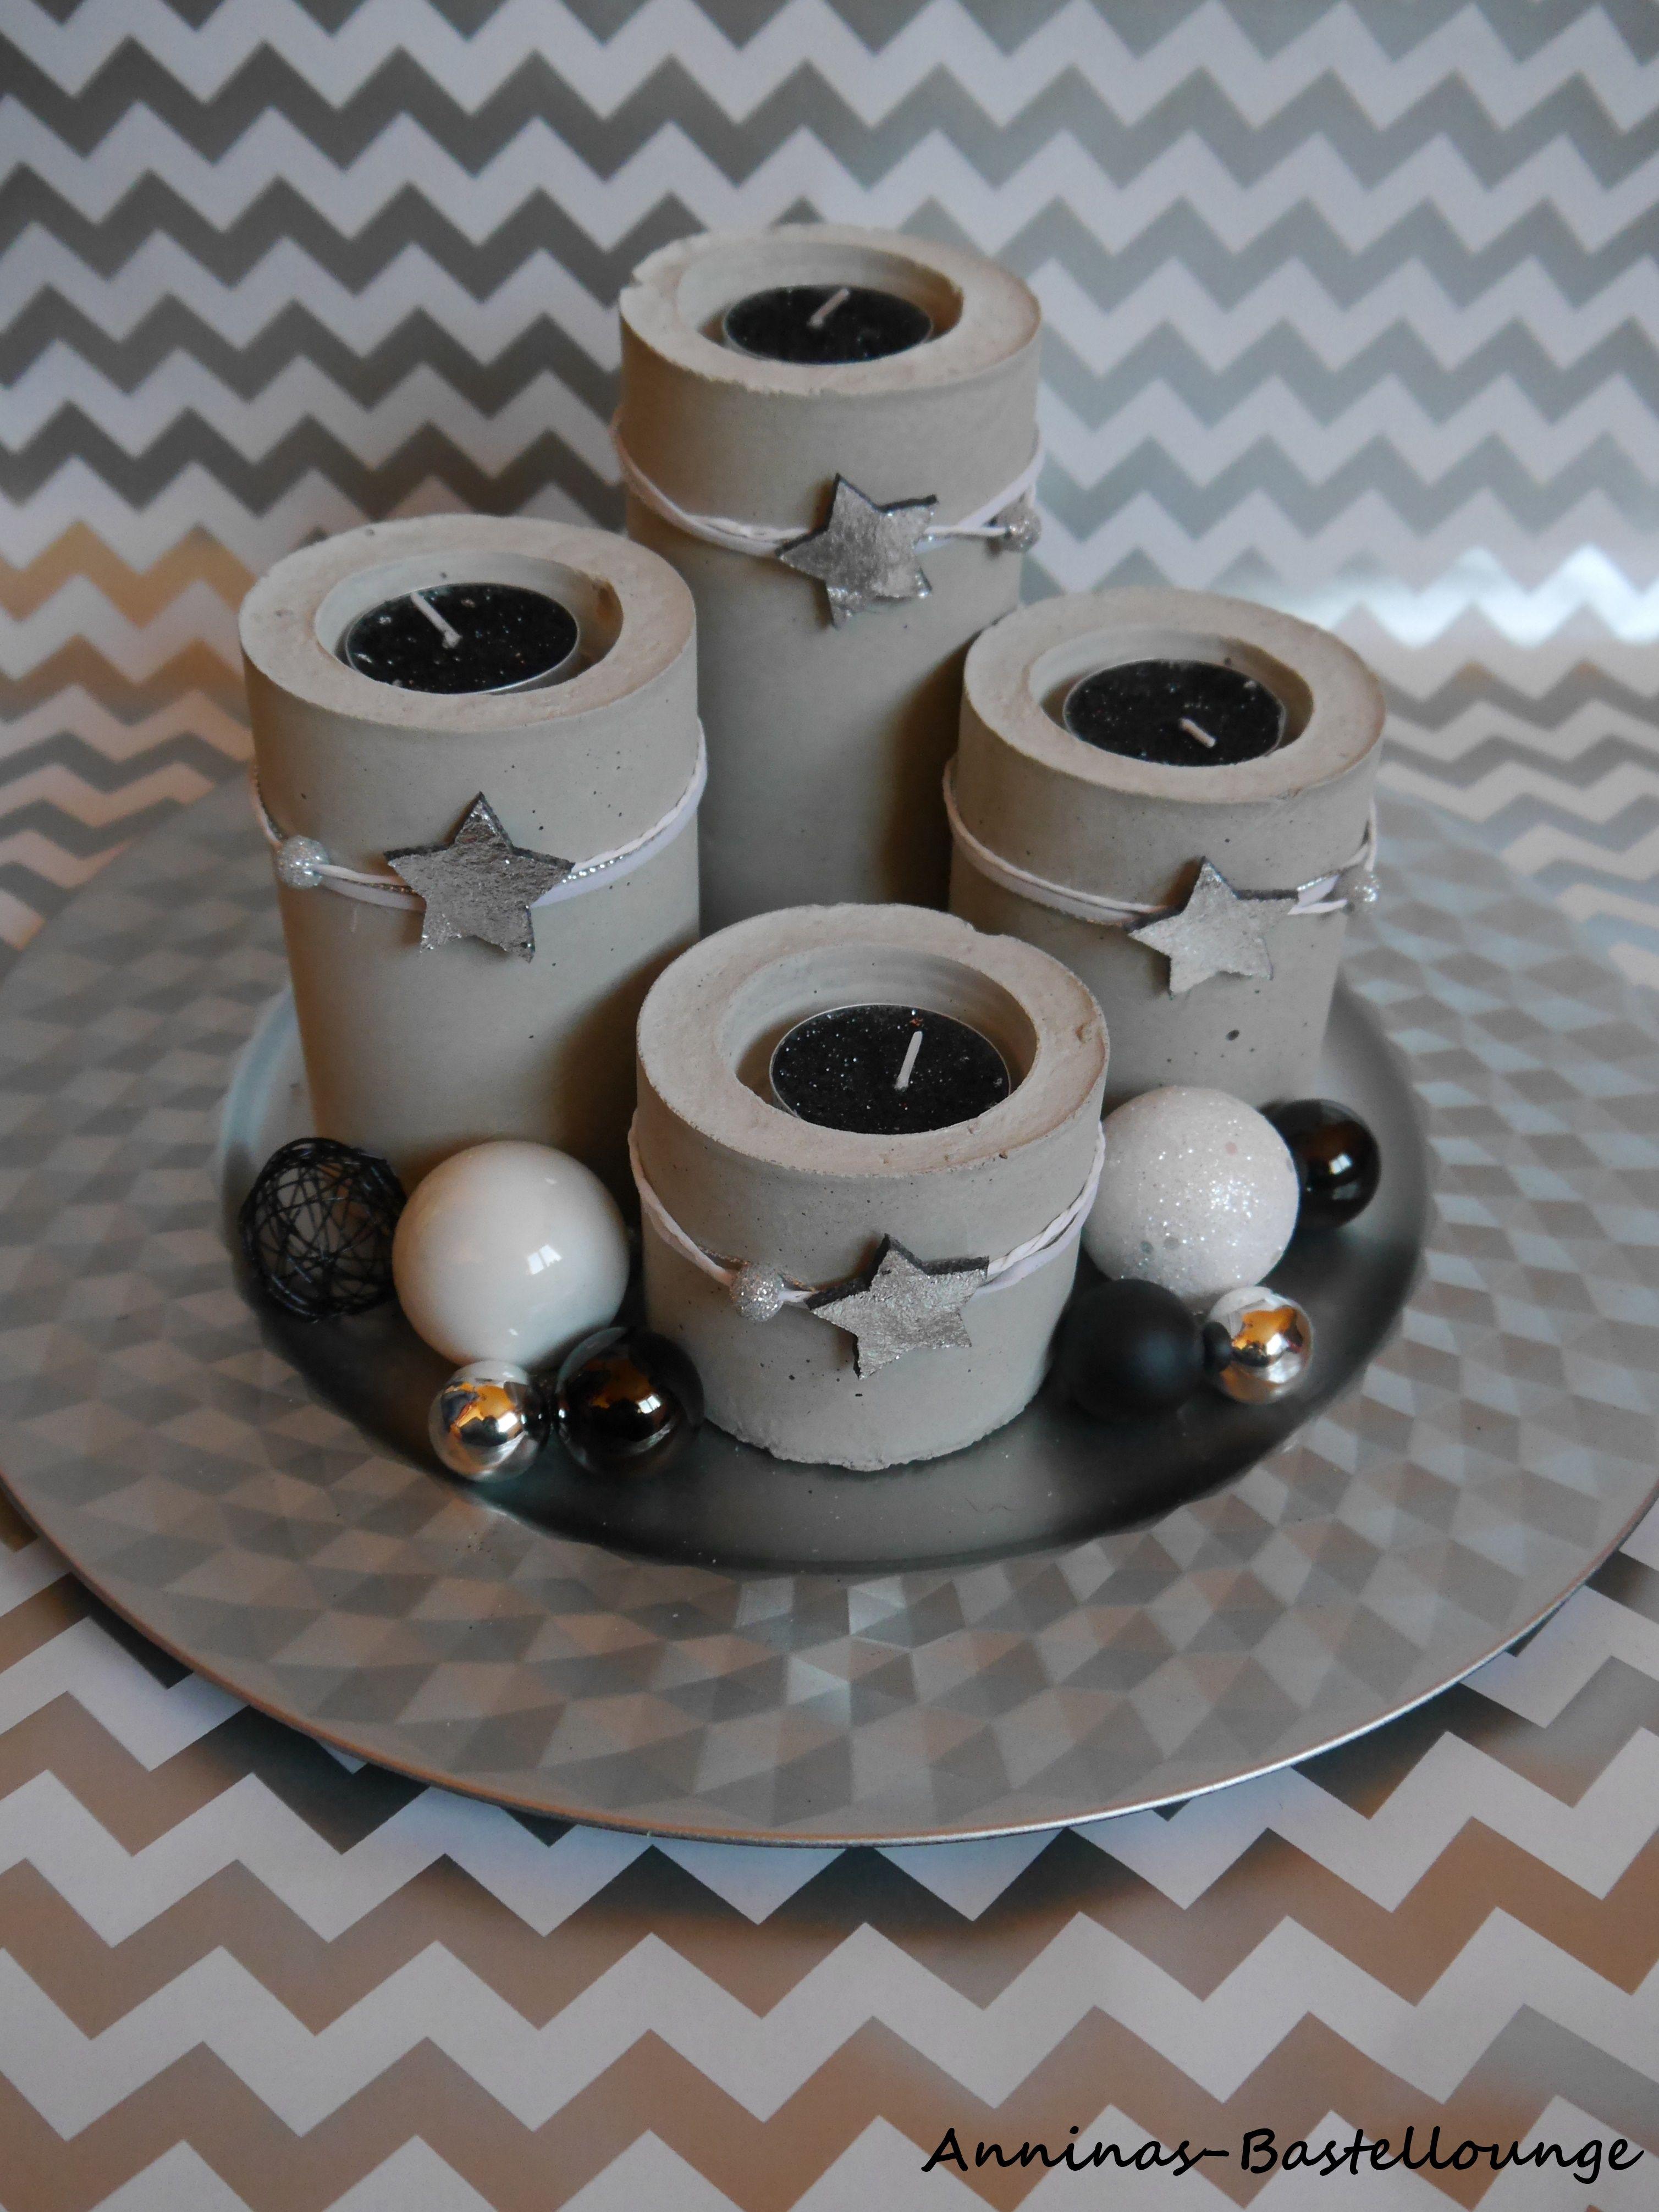 einzigartig basteln beton selber mischen design ideen garten design ideen. Black Bedroom Furniture Sets. Home Design Ideas